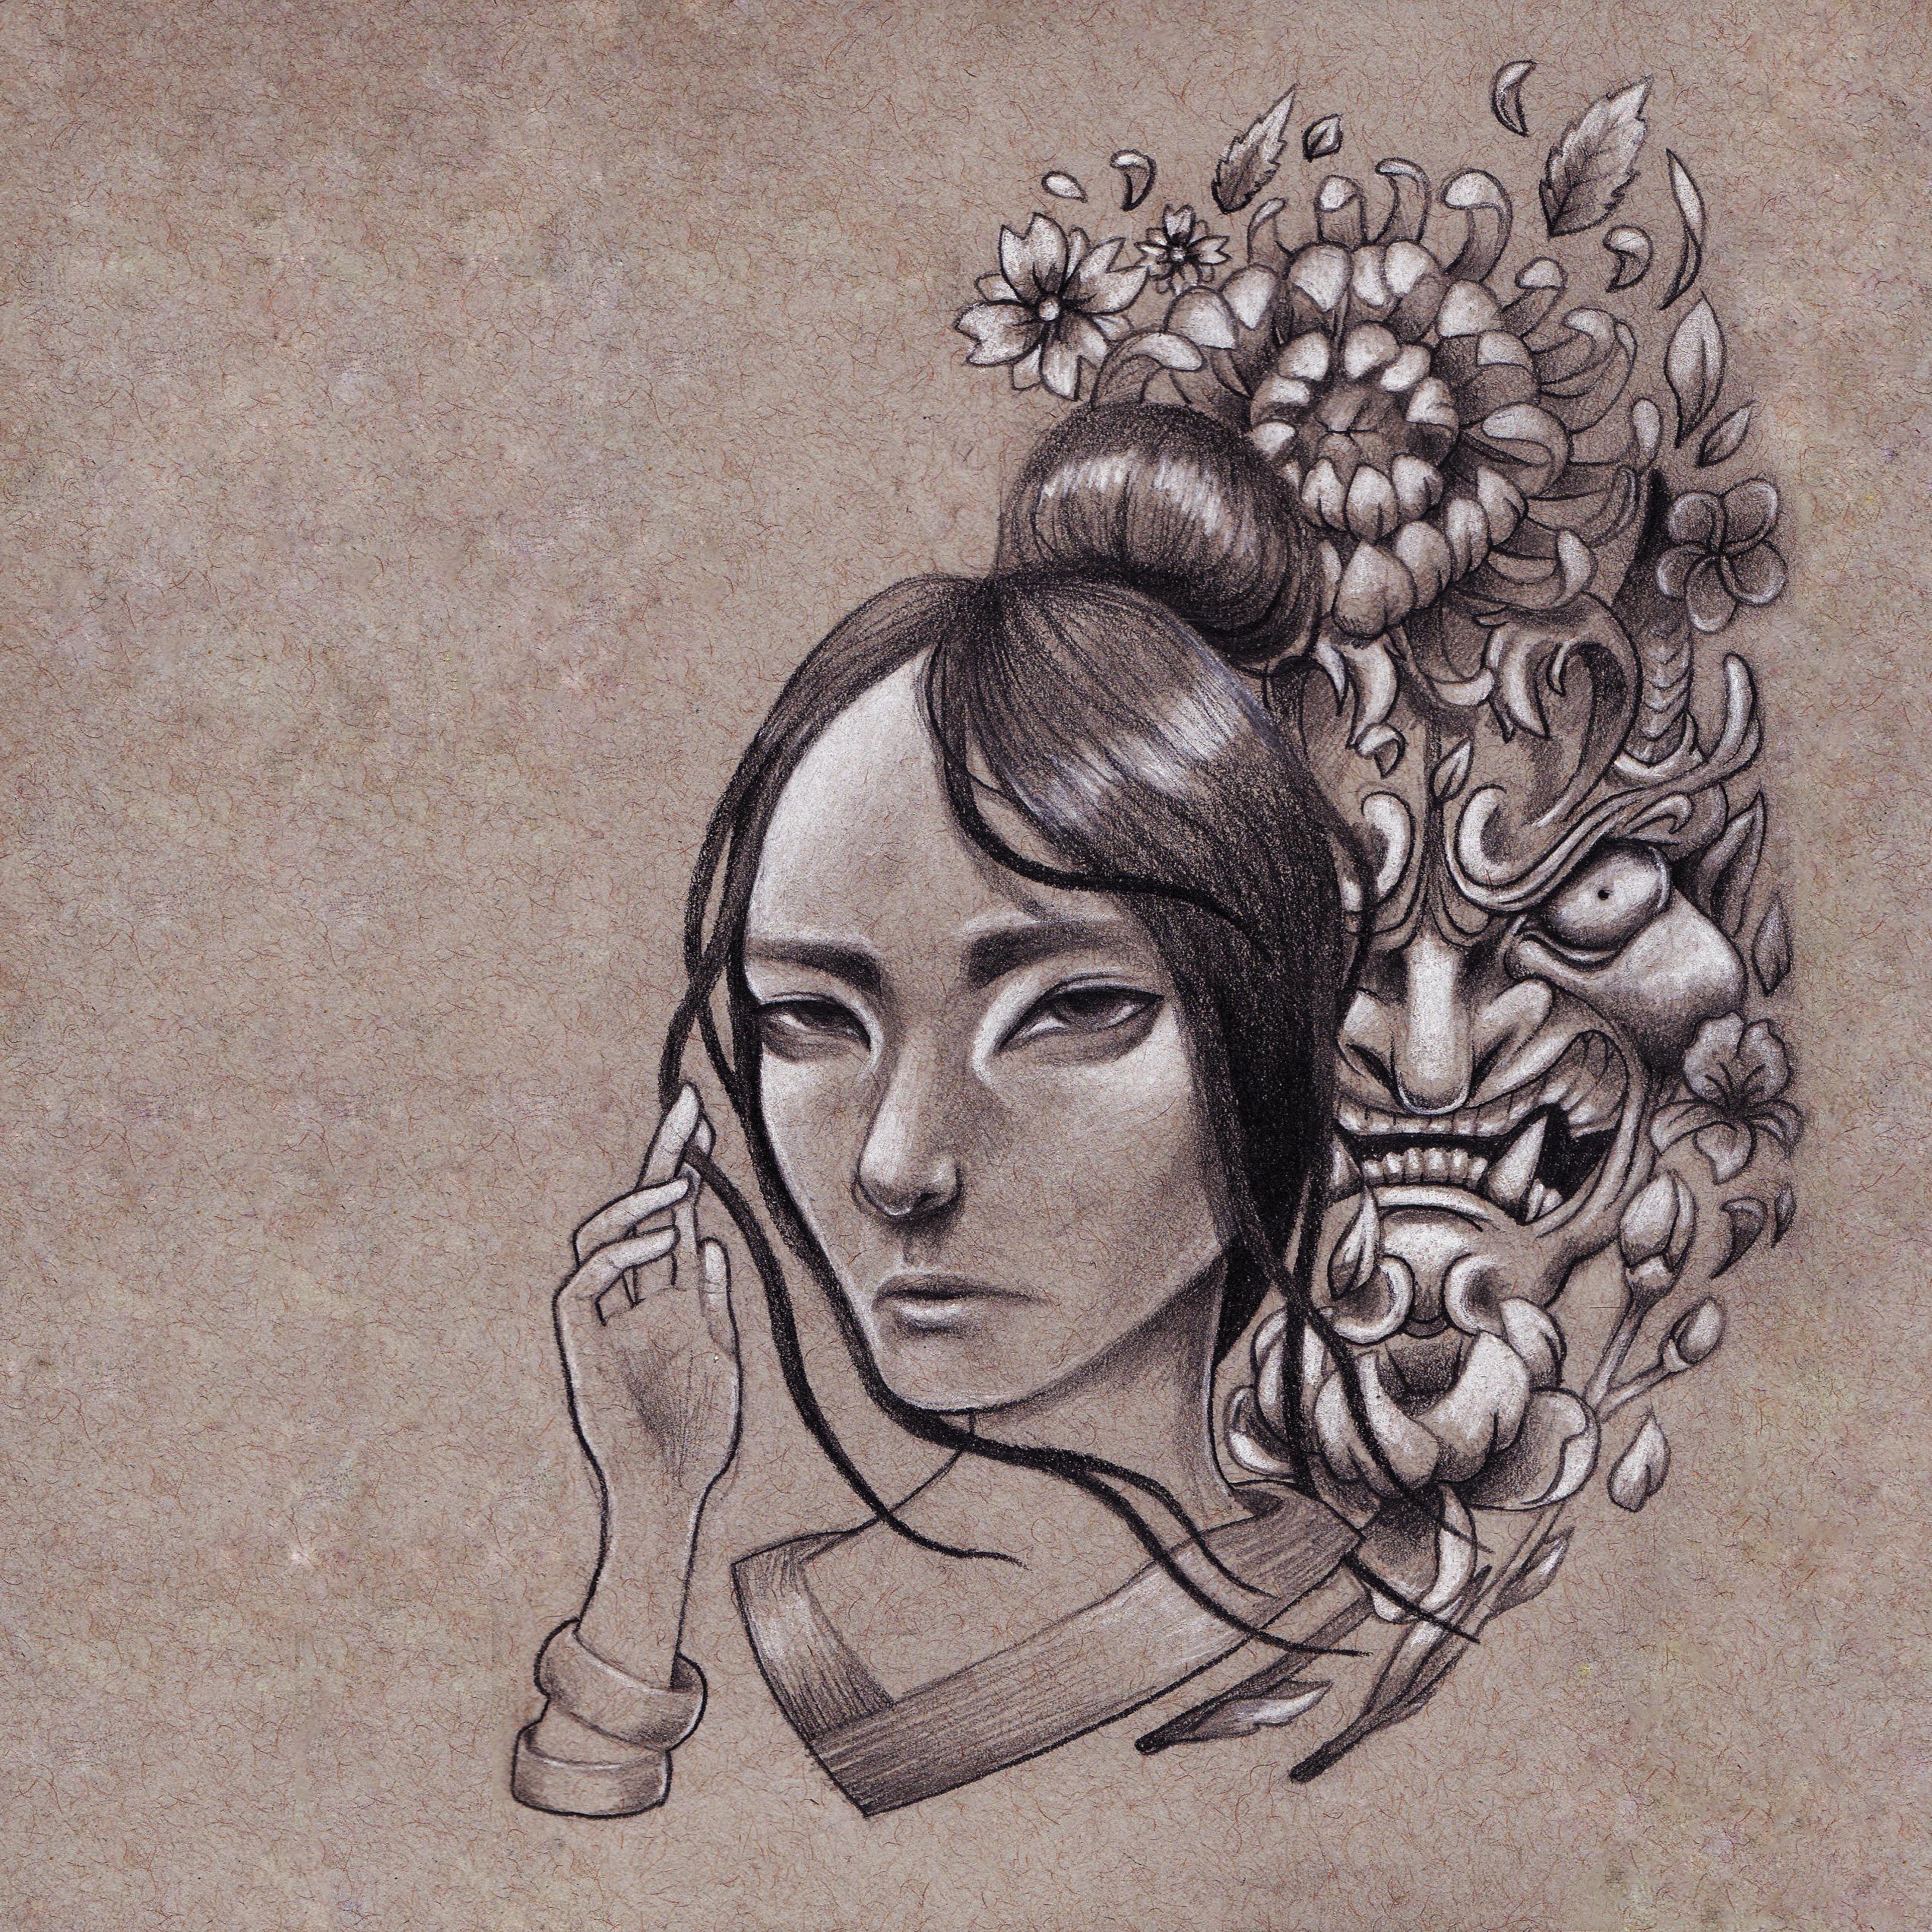 By Felix Abcede